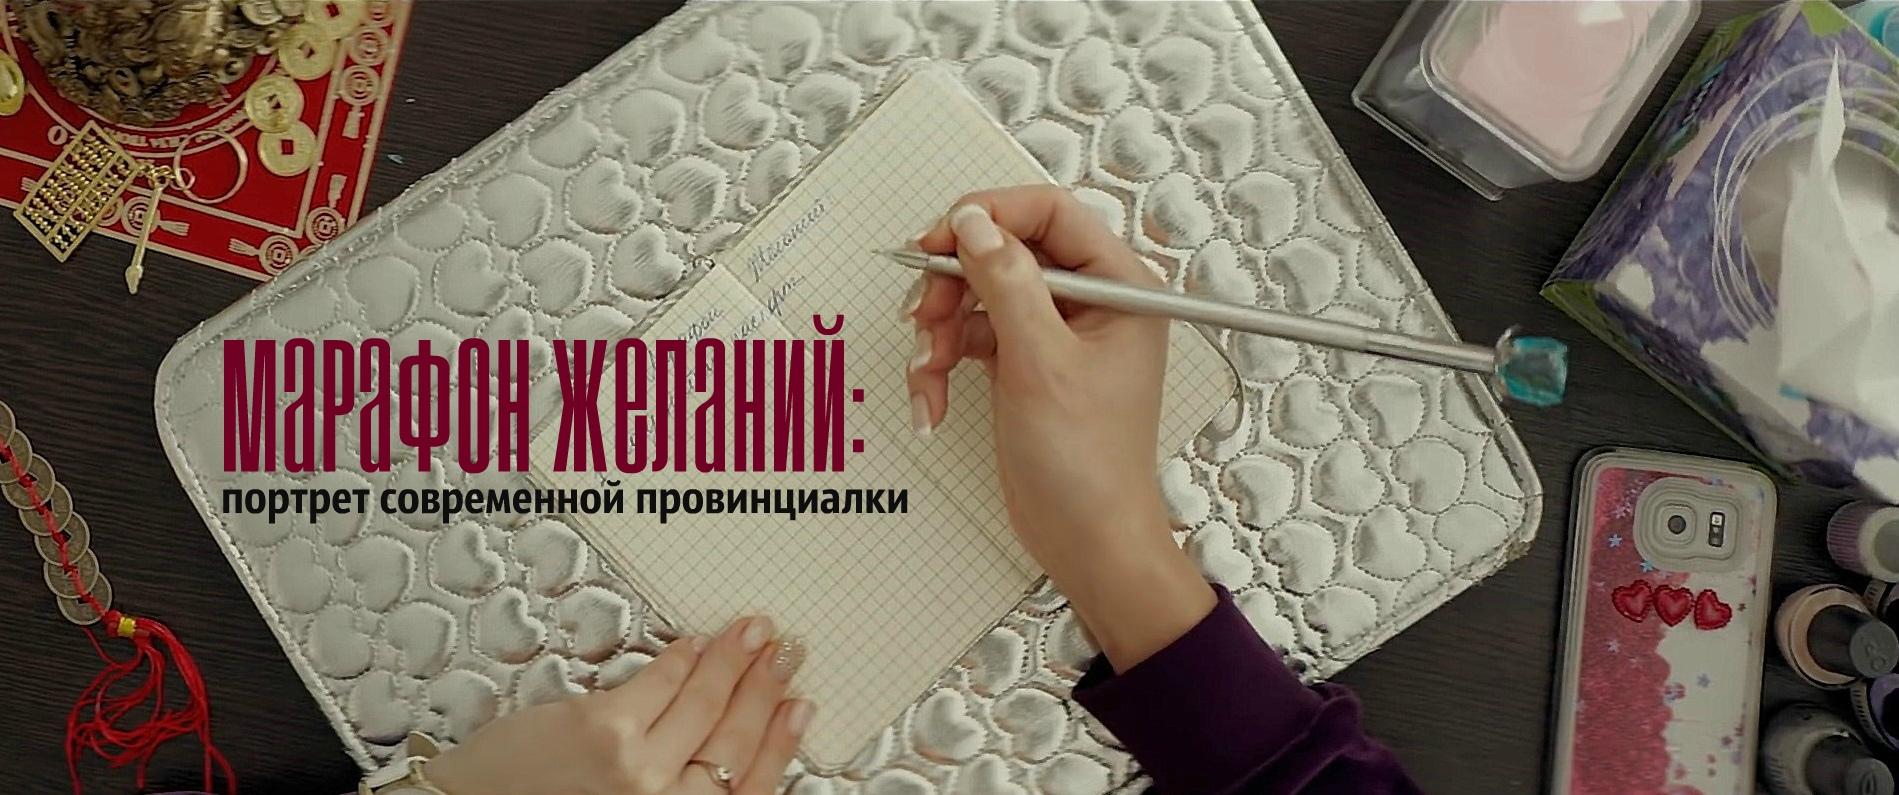 Марафон желаний отзыв о фильме, актёры и роли, трейлер, саундтрек